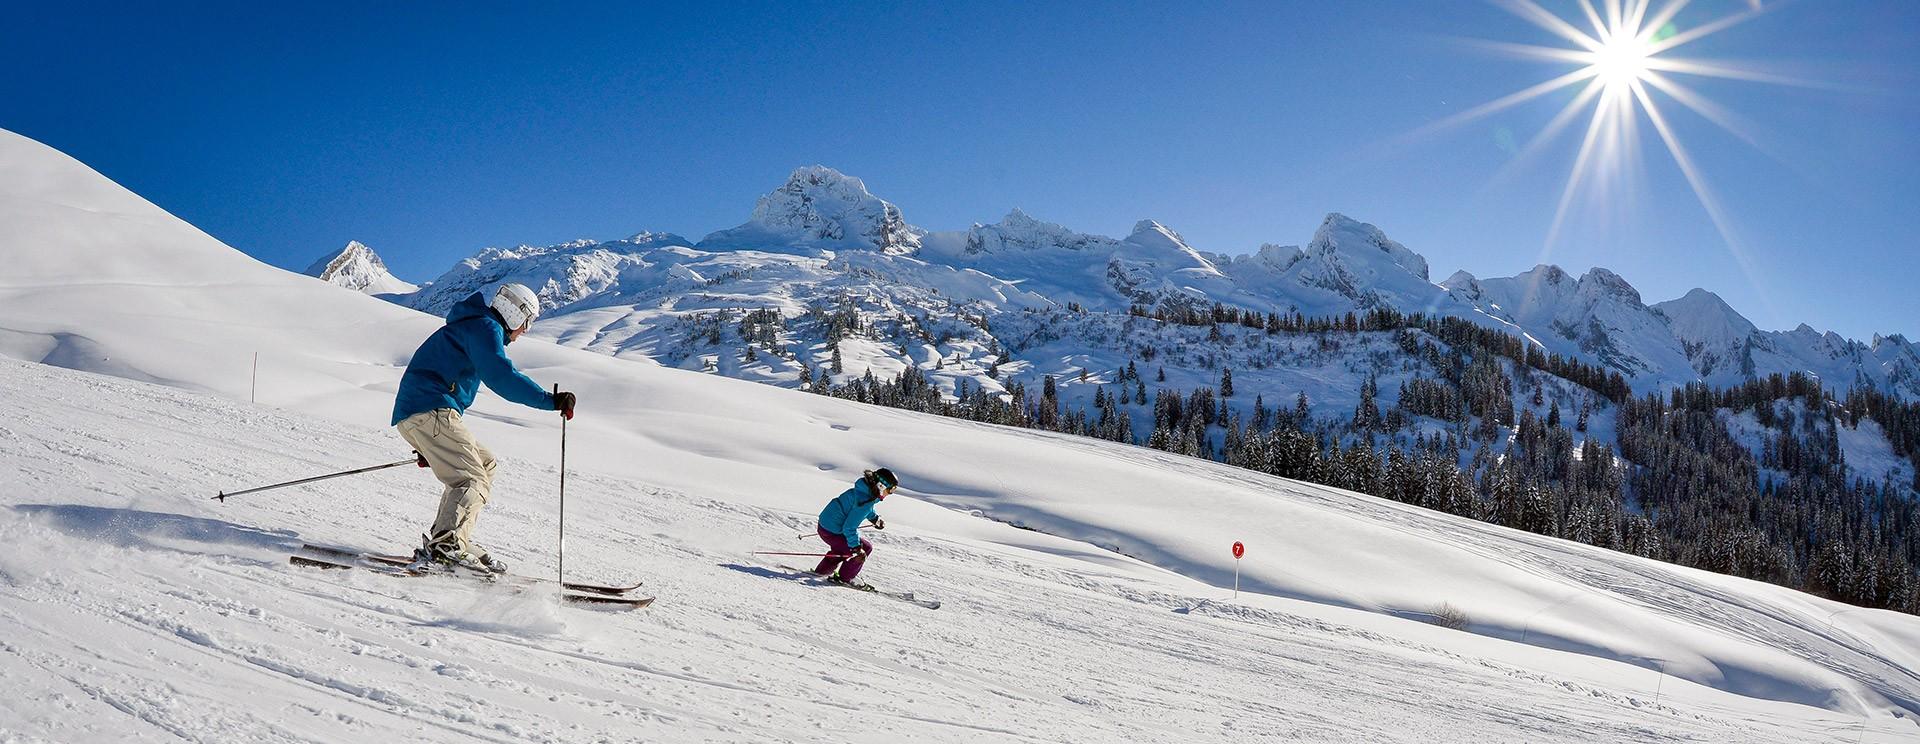 tetiere-printemps-ski-2157